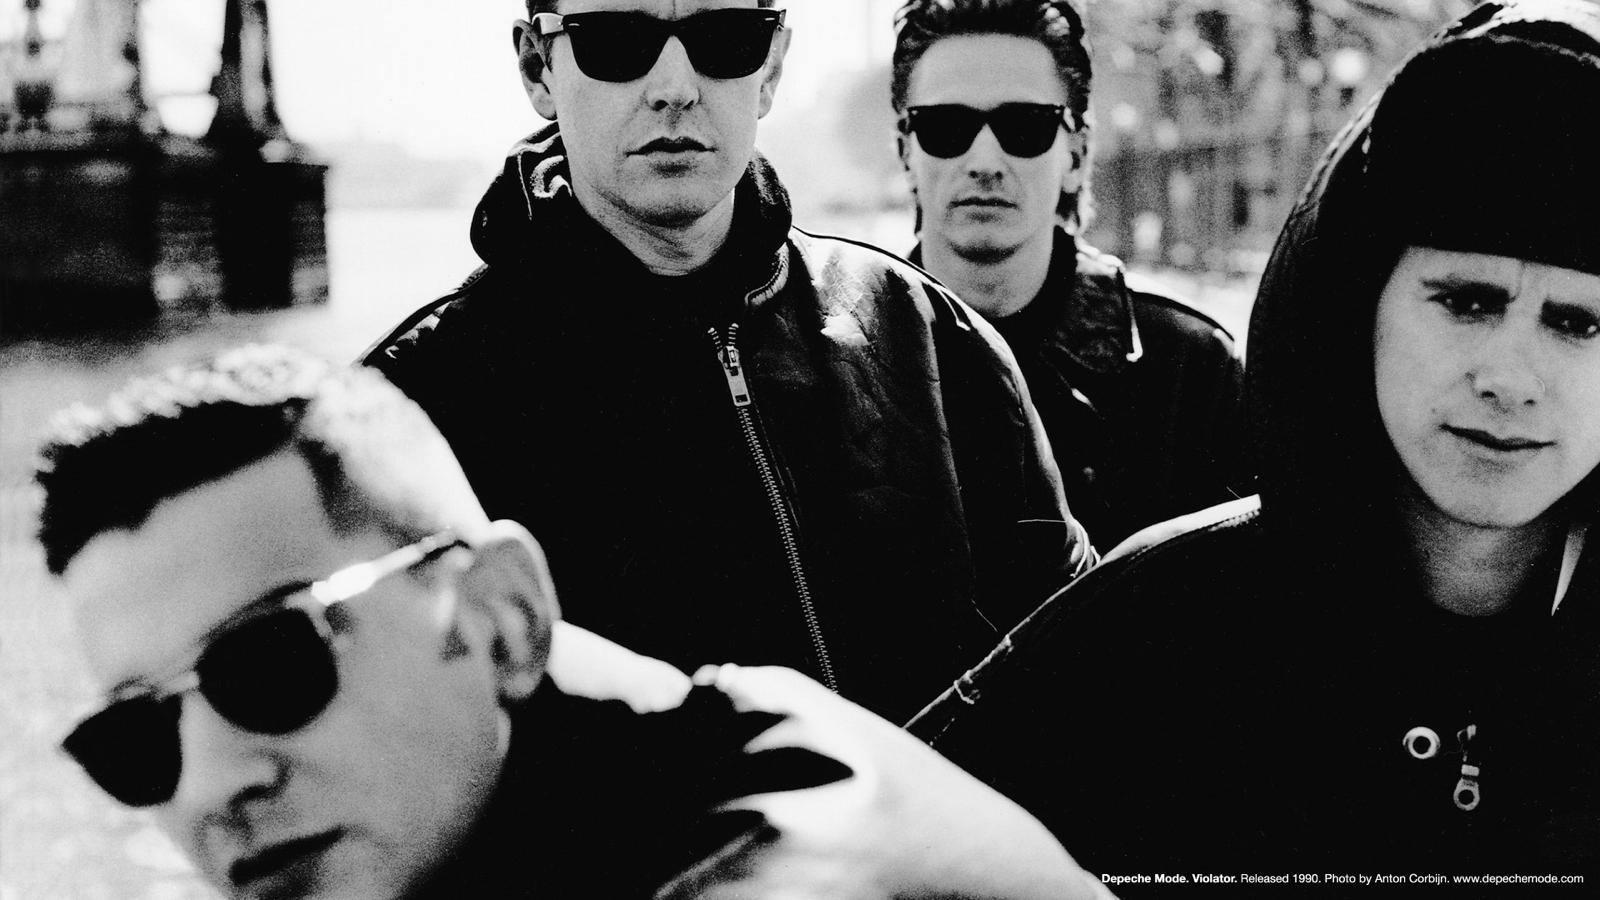 Depeche Mode Portrait 1990 02